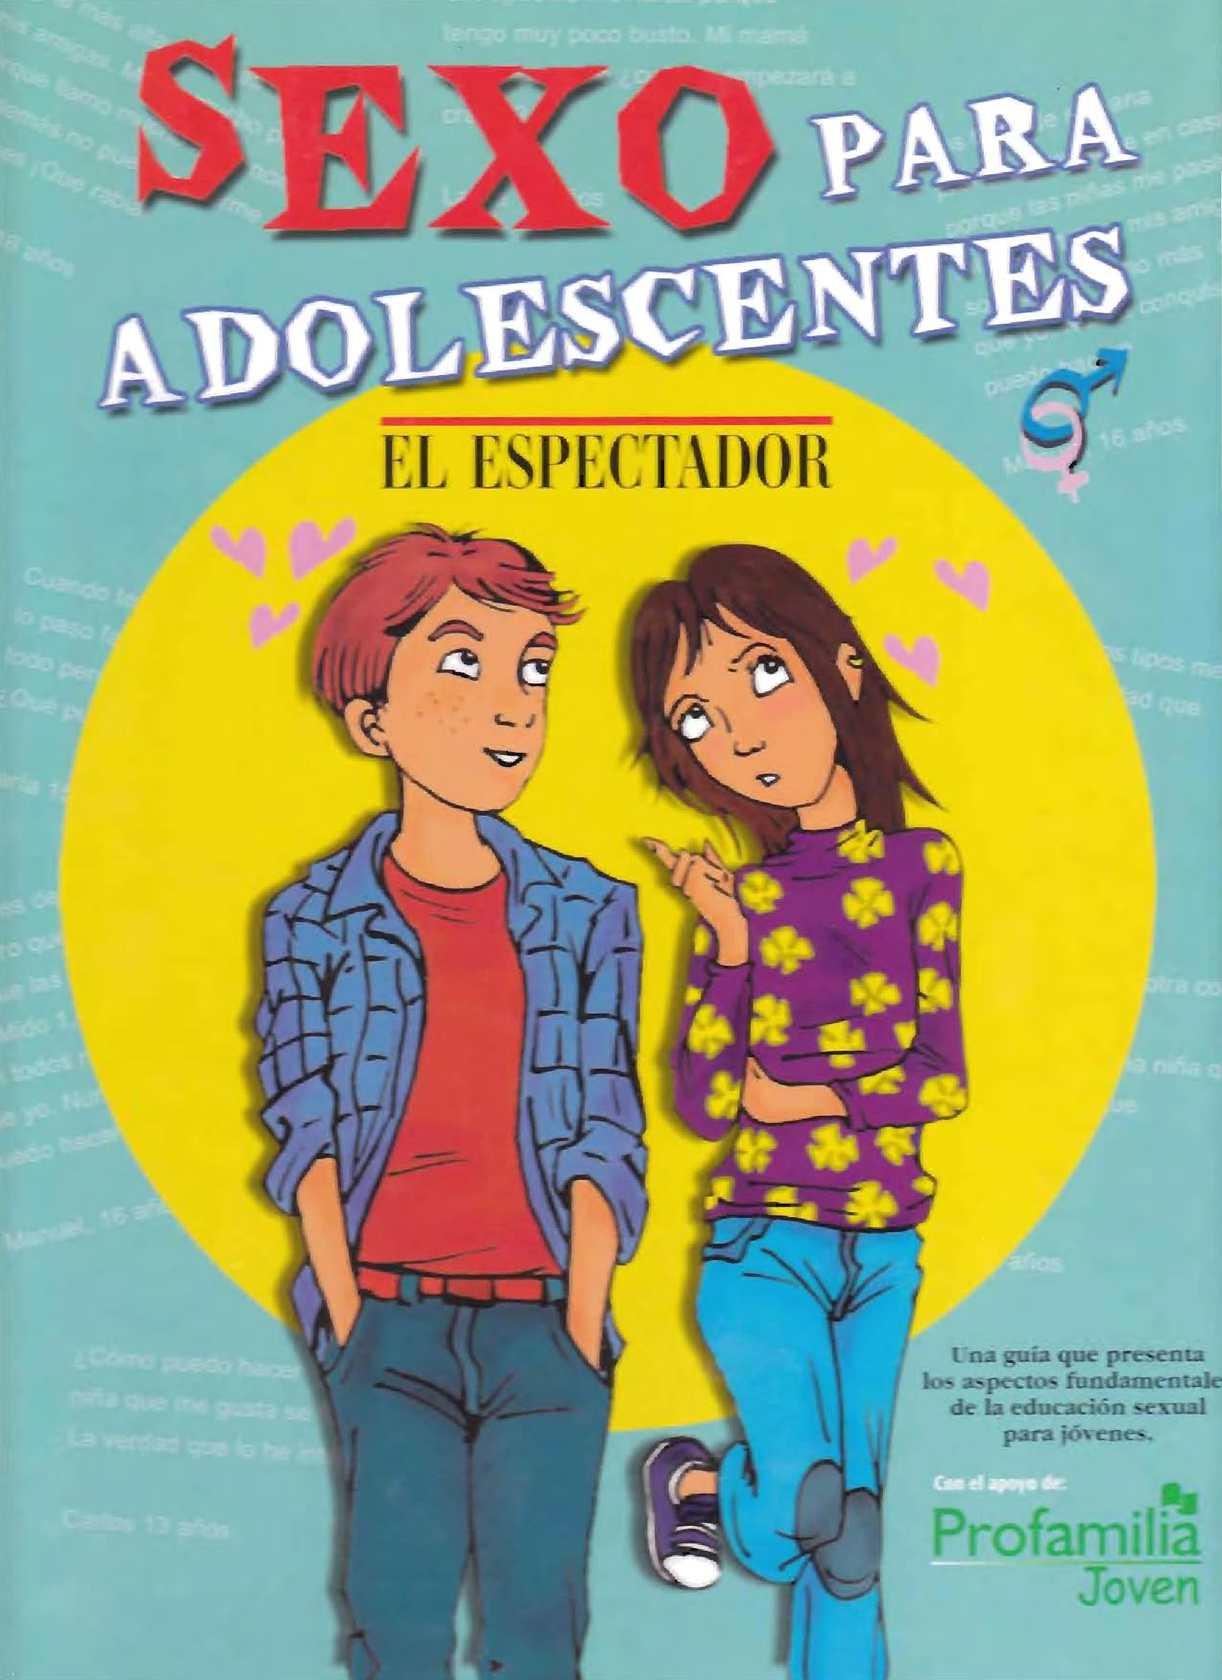 Sexualidad Adolescentes Sexualidad Adolescentes En En Calaméo Sexualidad Adolescentes Calaméo En Sexualidad Calaméo Calaméo cOqqSTFAU